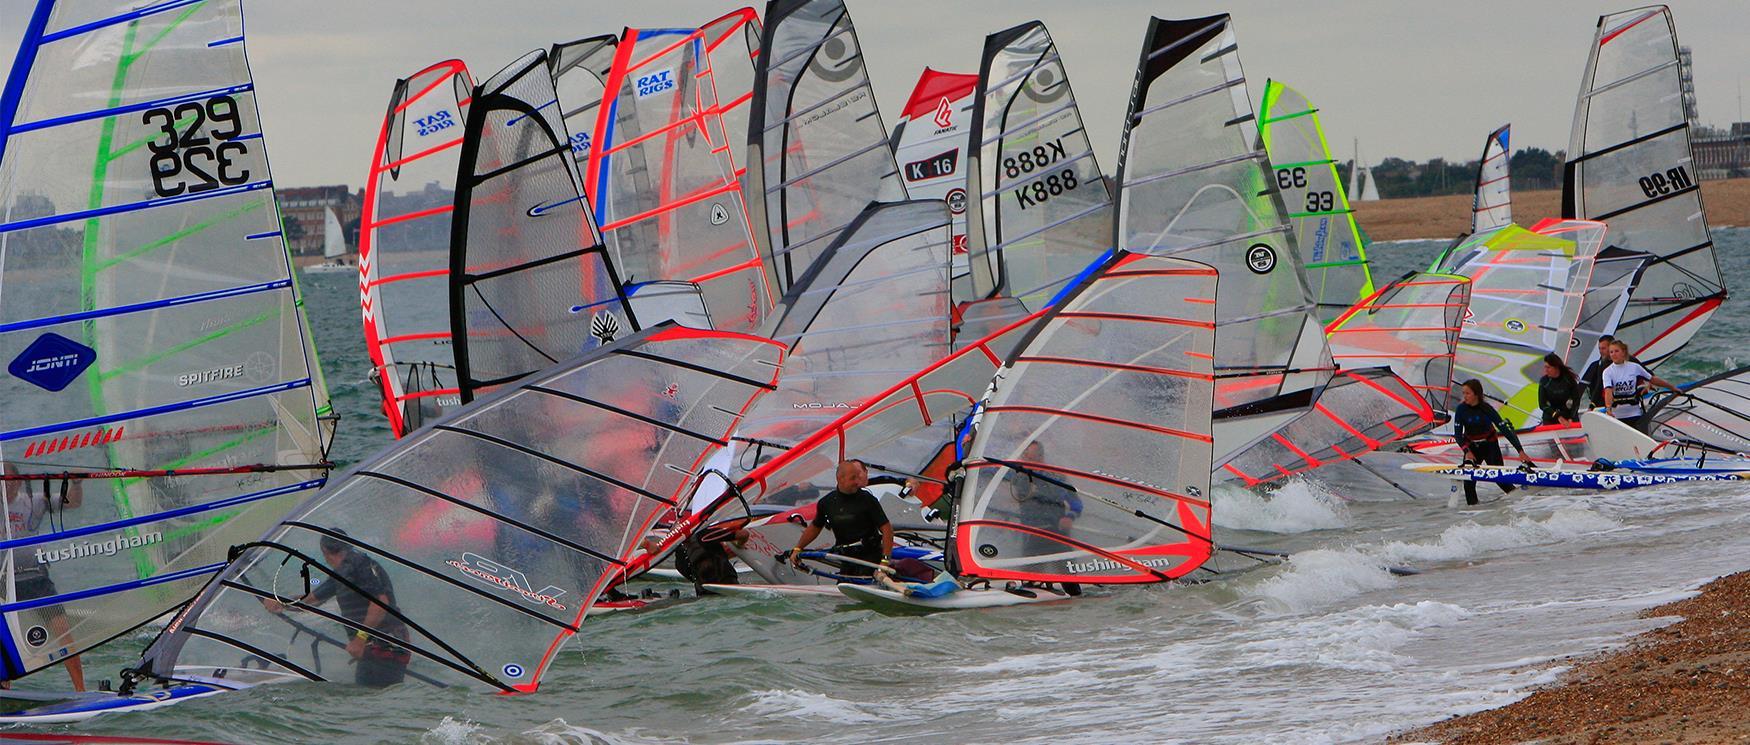 Windsurfing at Hayling Island Beach